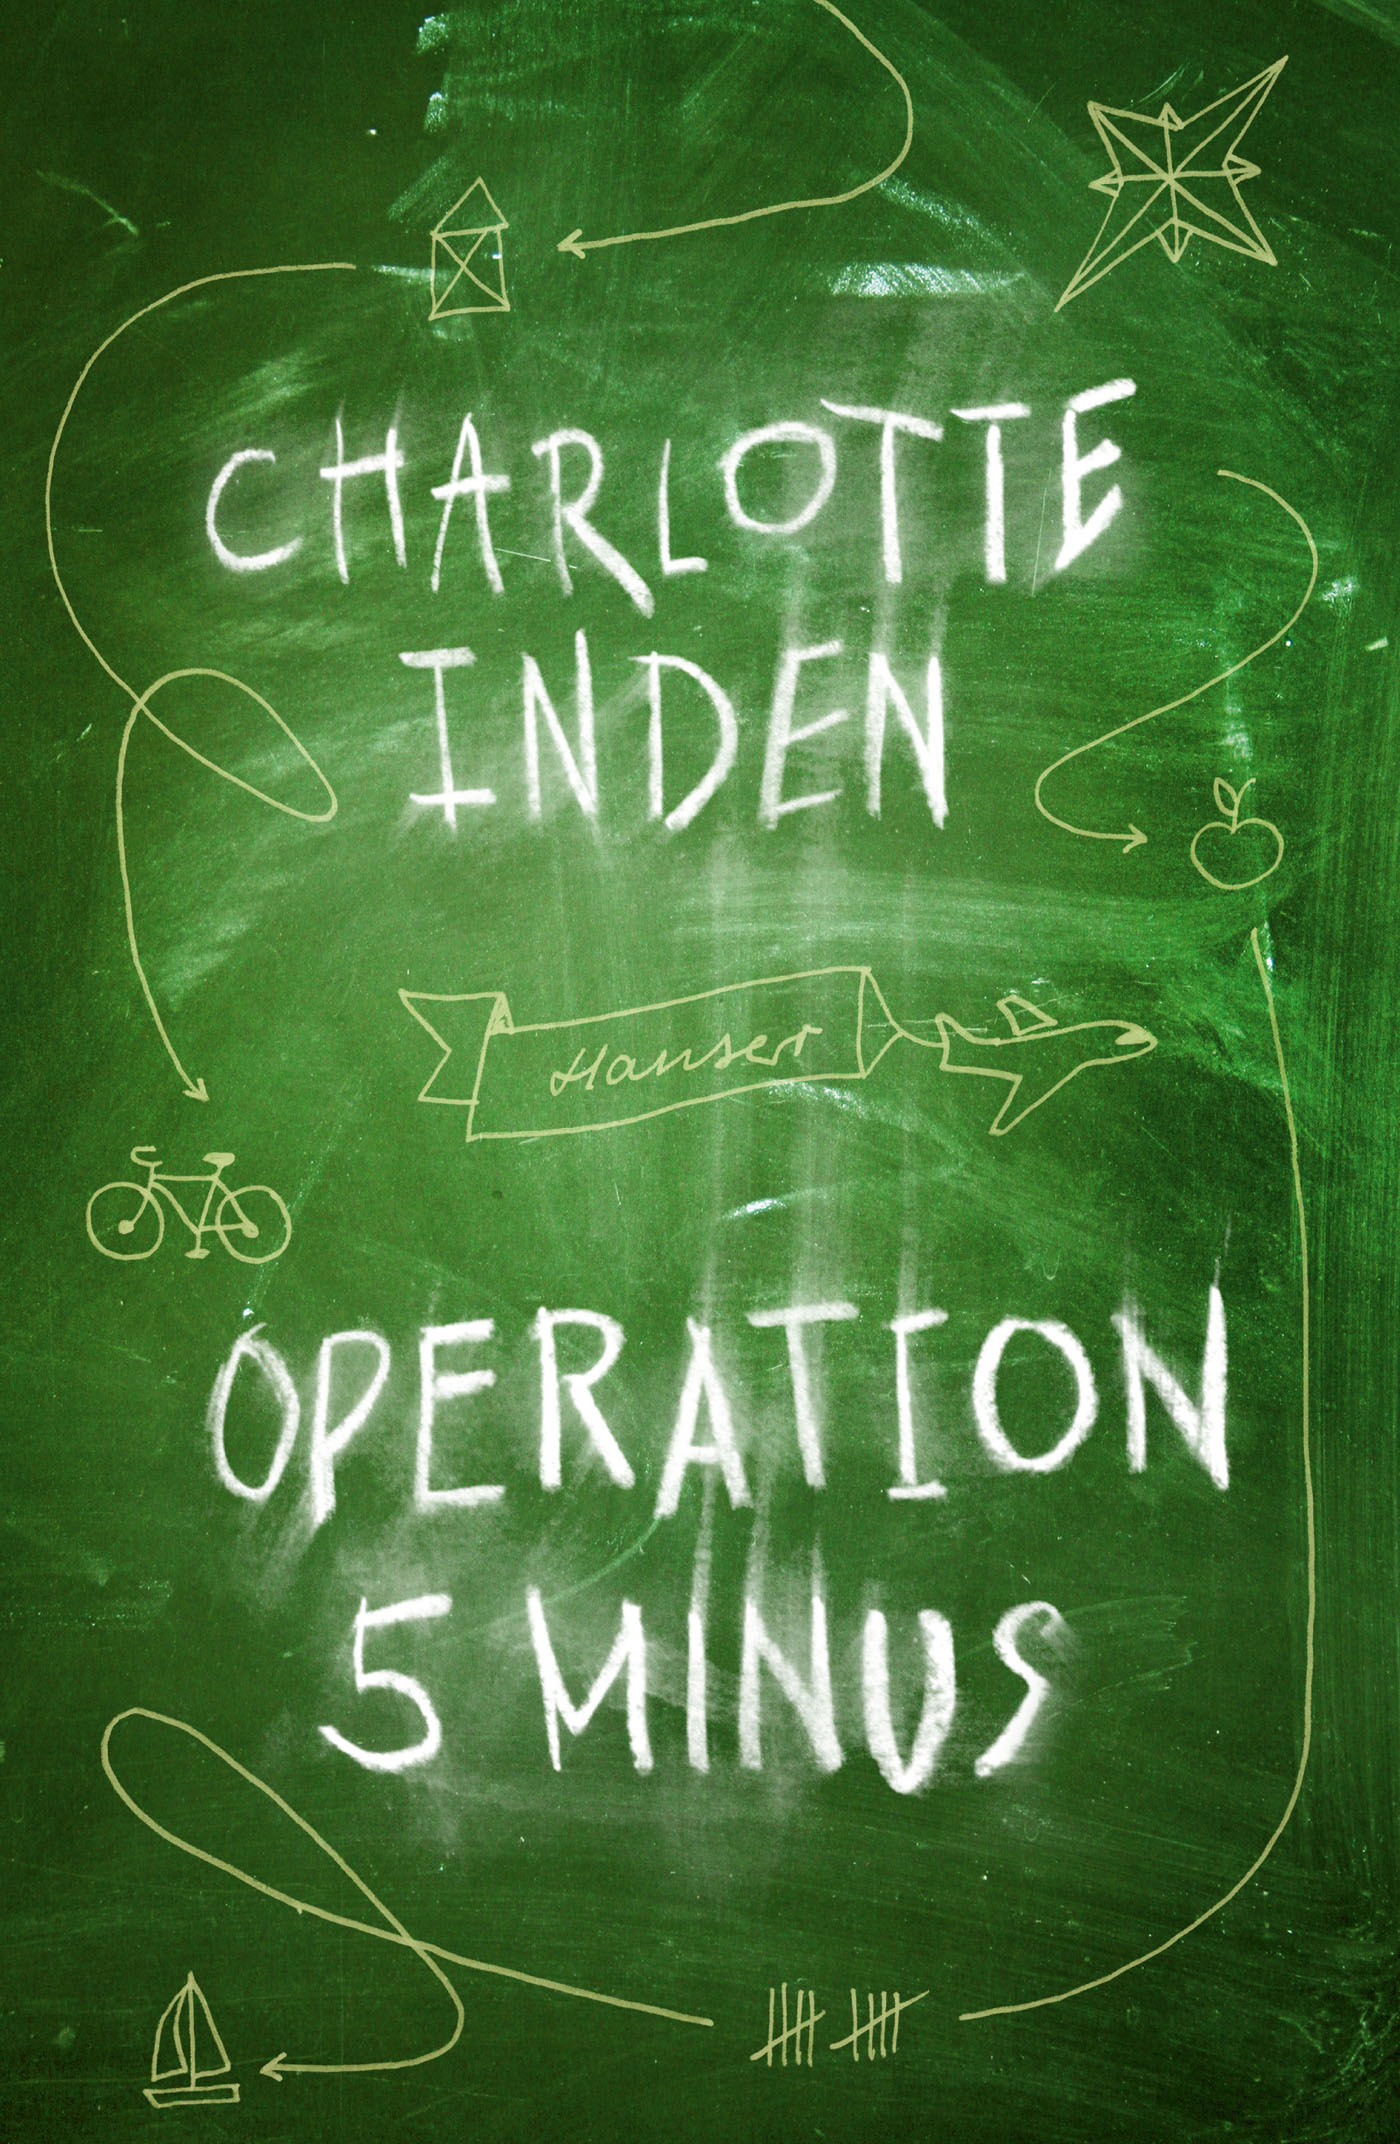 Operation 5 minus - Inden, Charlotte